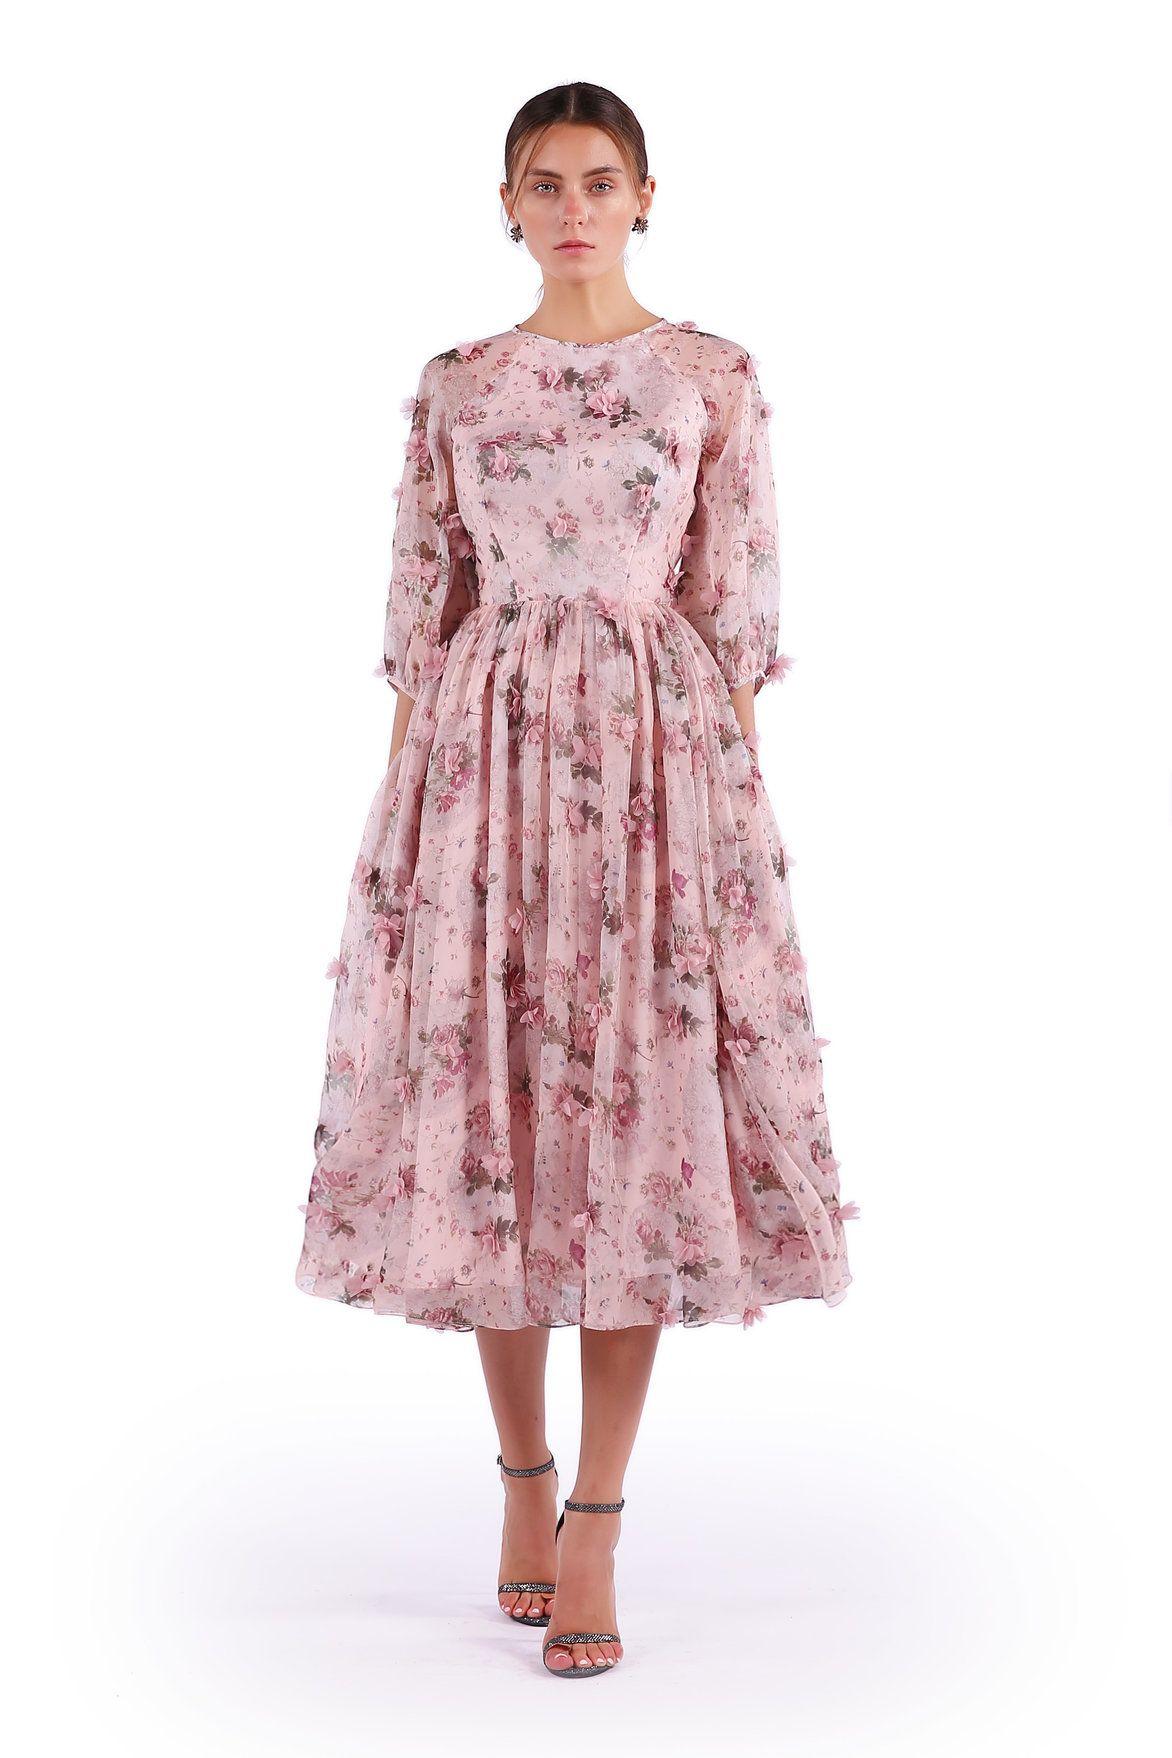 Robe fleurs rose Isabel Garcia | Isabel Garcia Tendance à